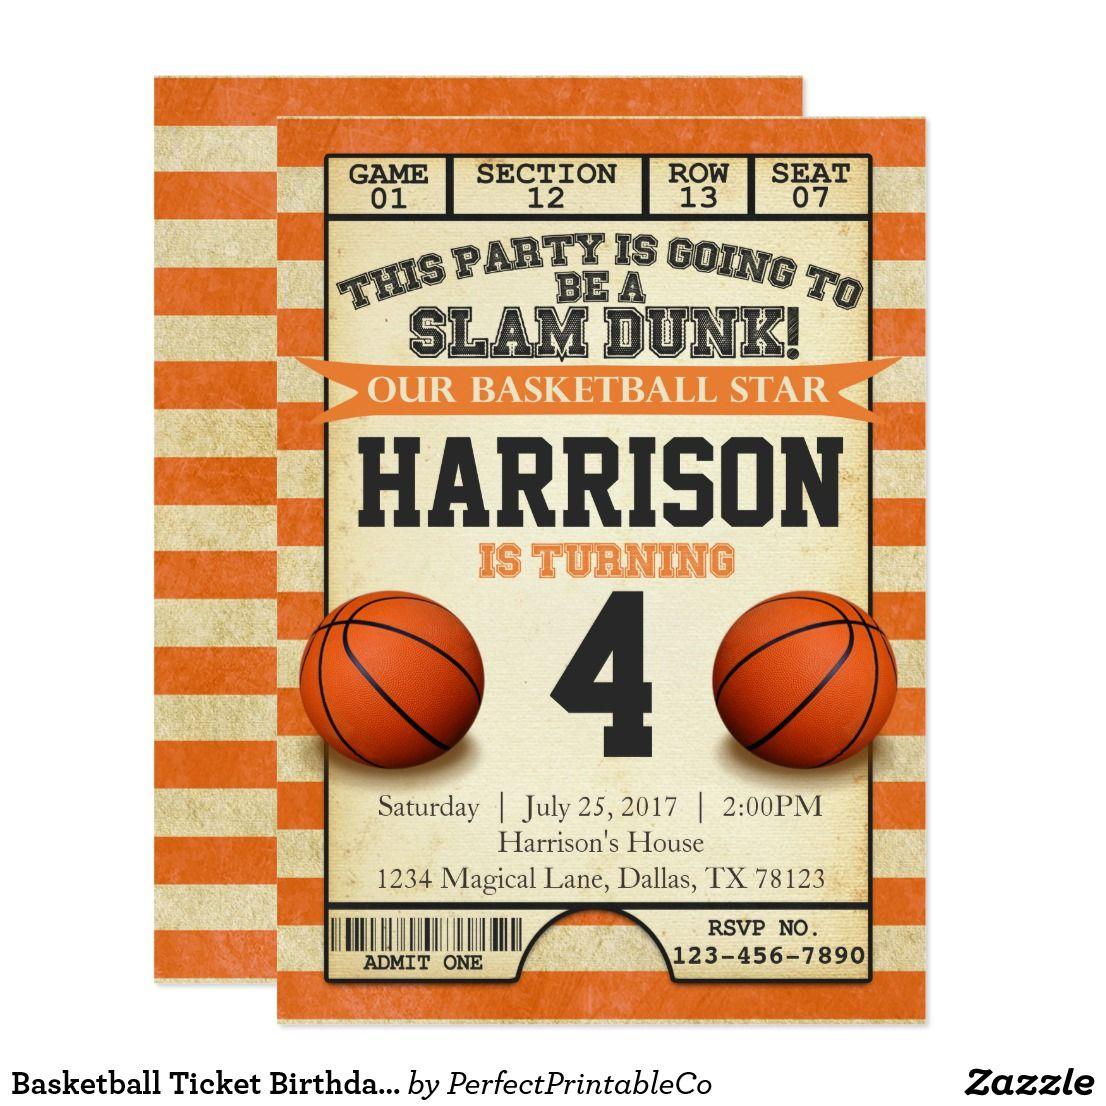 Basketball Ticket Birthday Party Invitation Invite | Pinterest ...